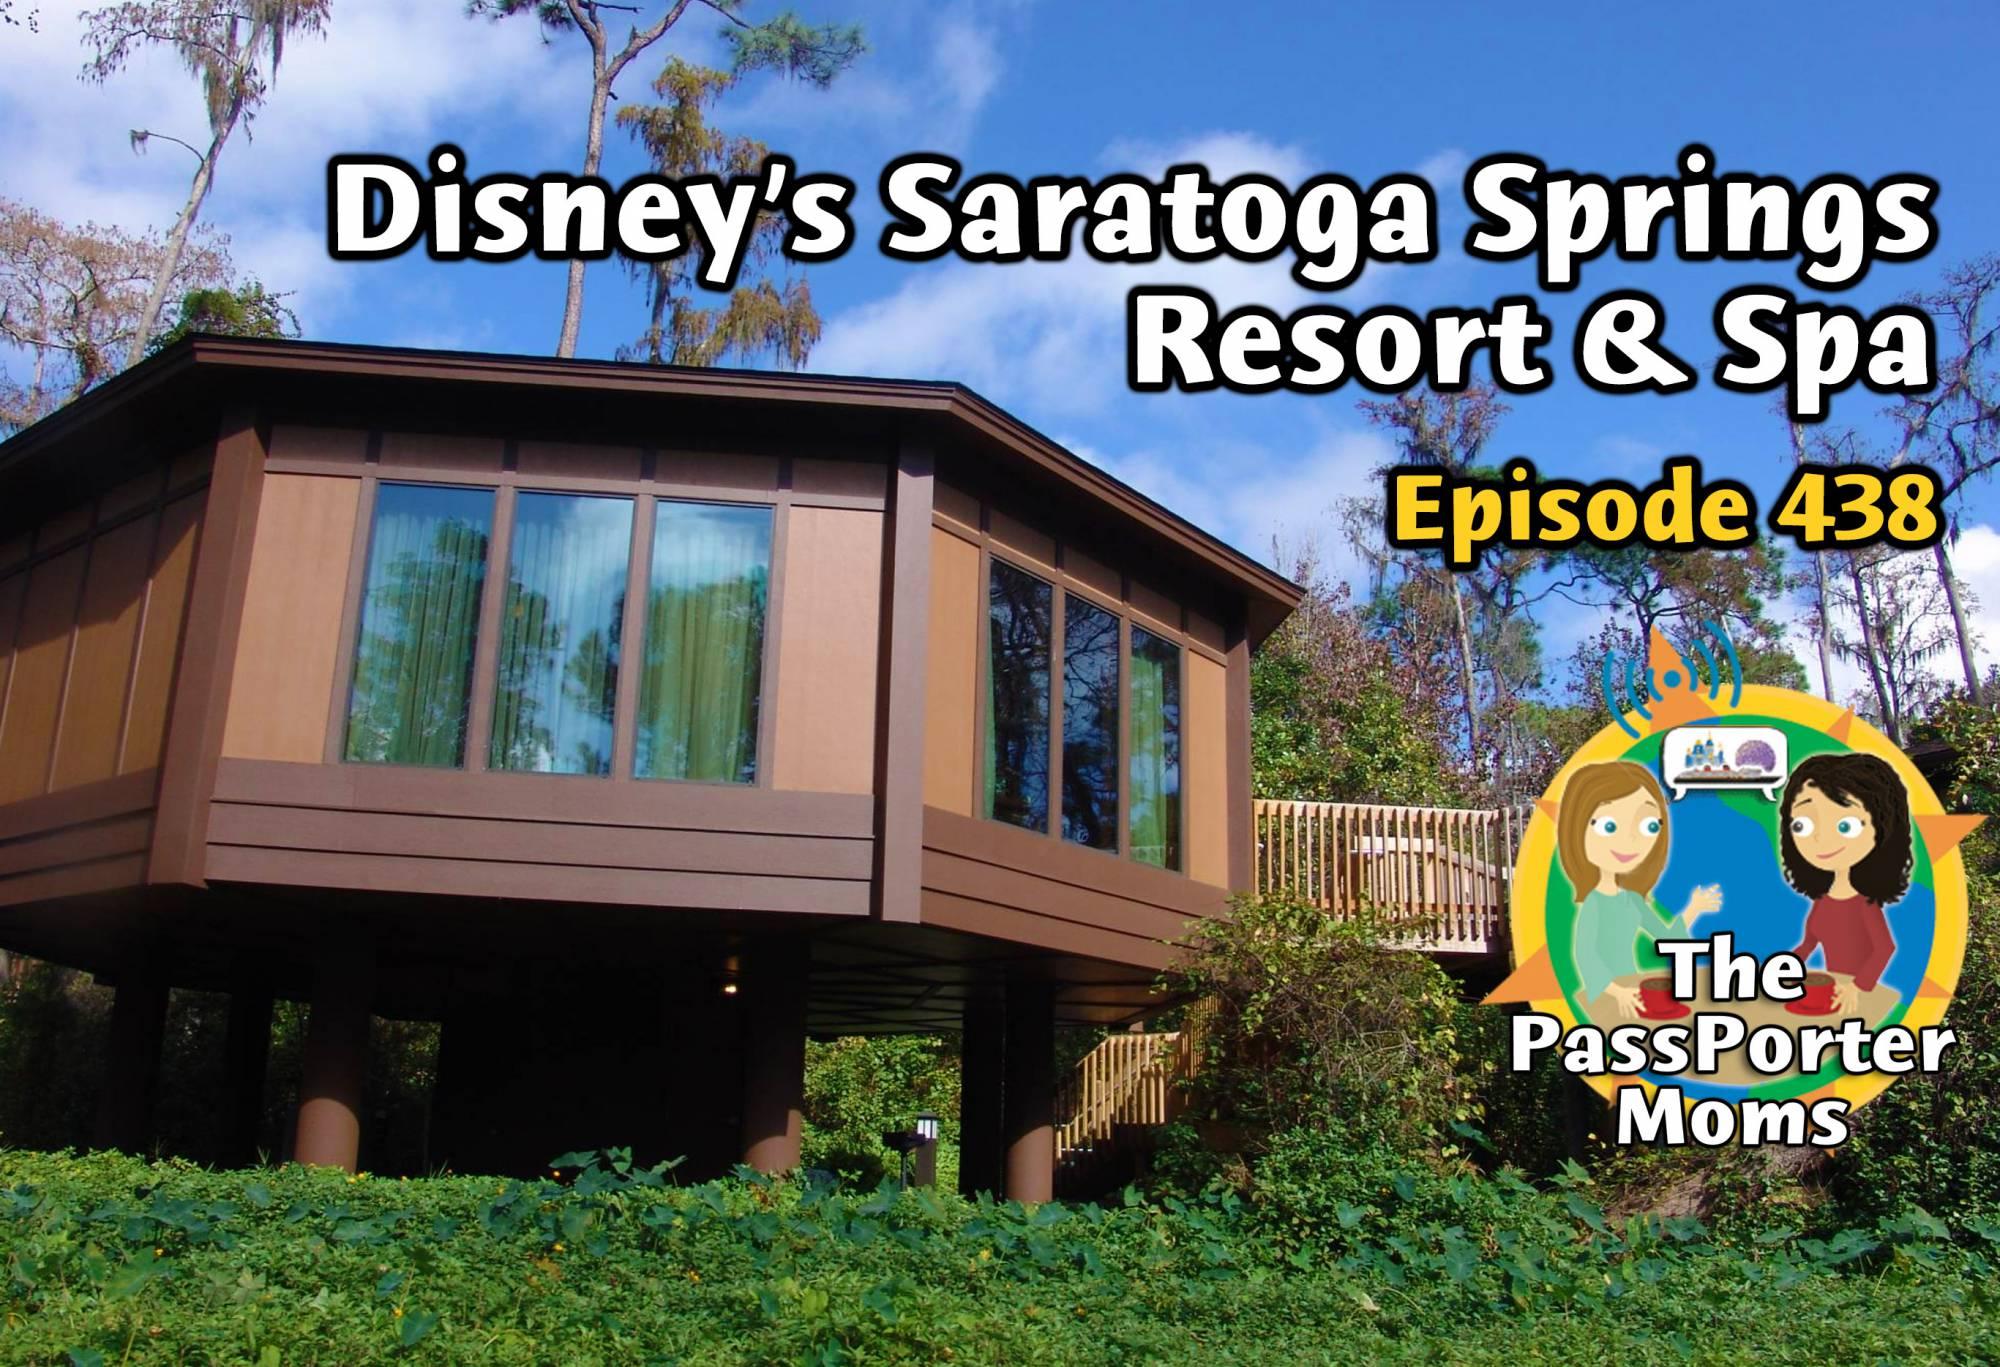 Saratoga Springs Resort & Spa